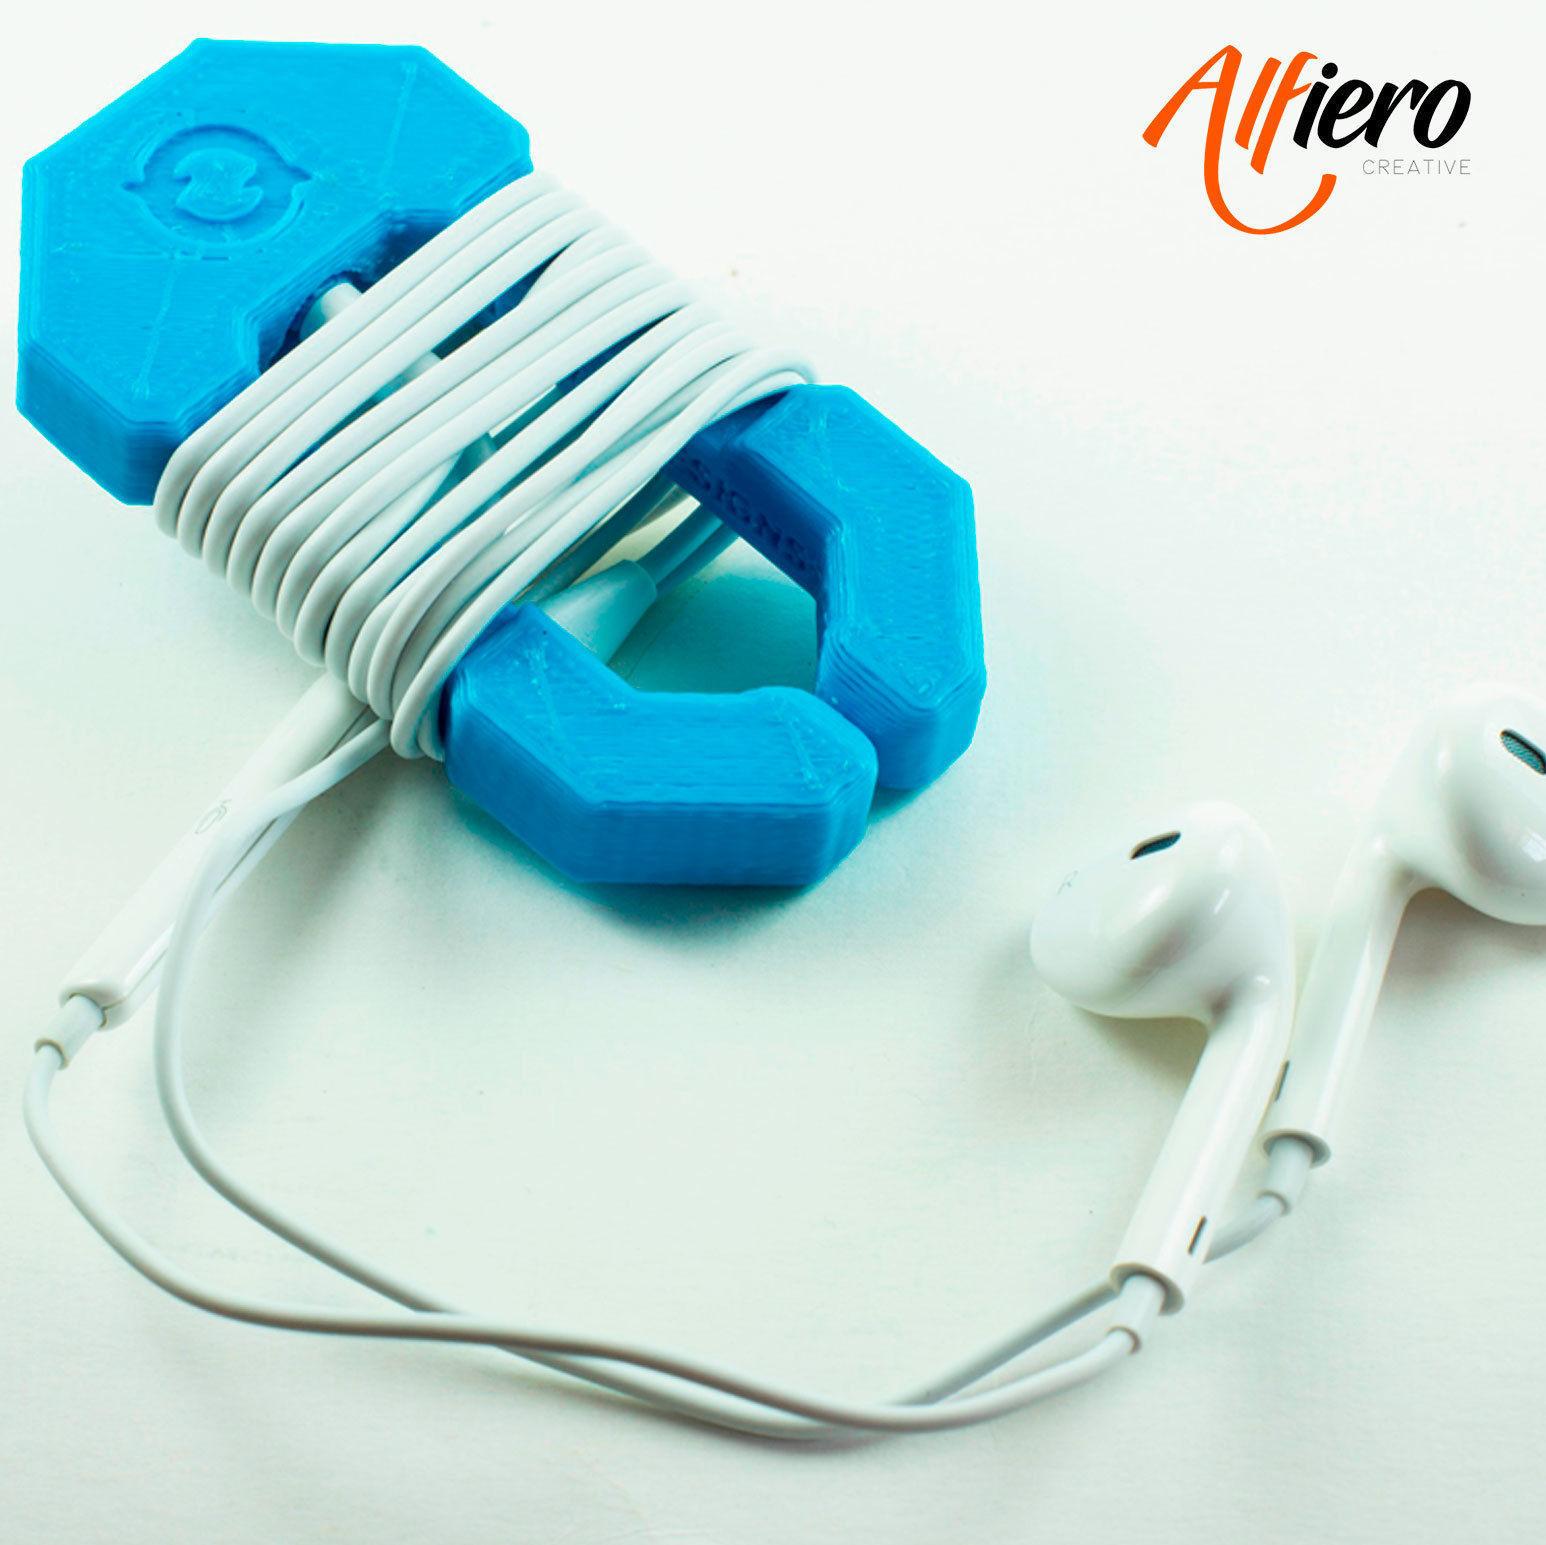 Cable Winder ROLLO 3DPG1